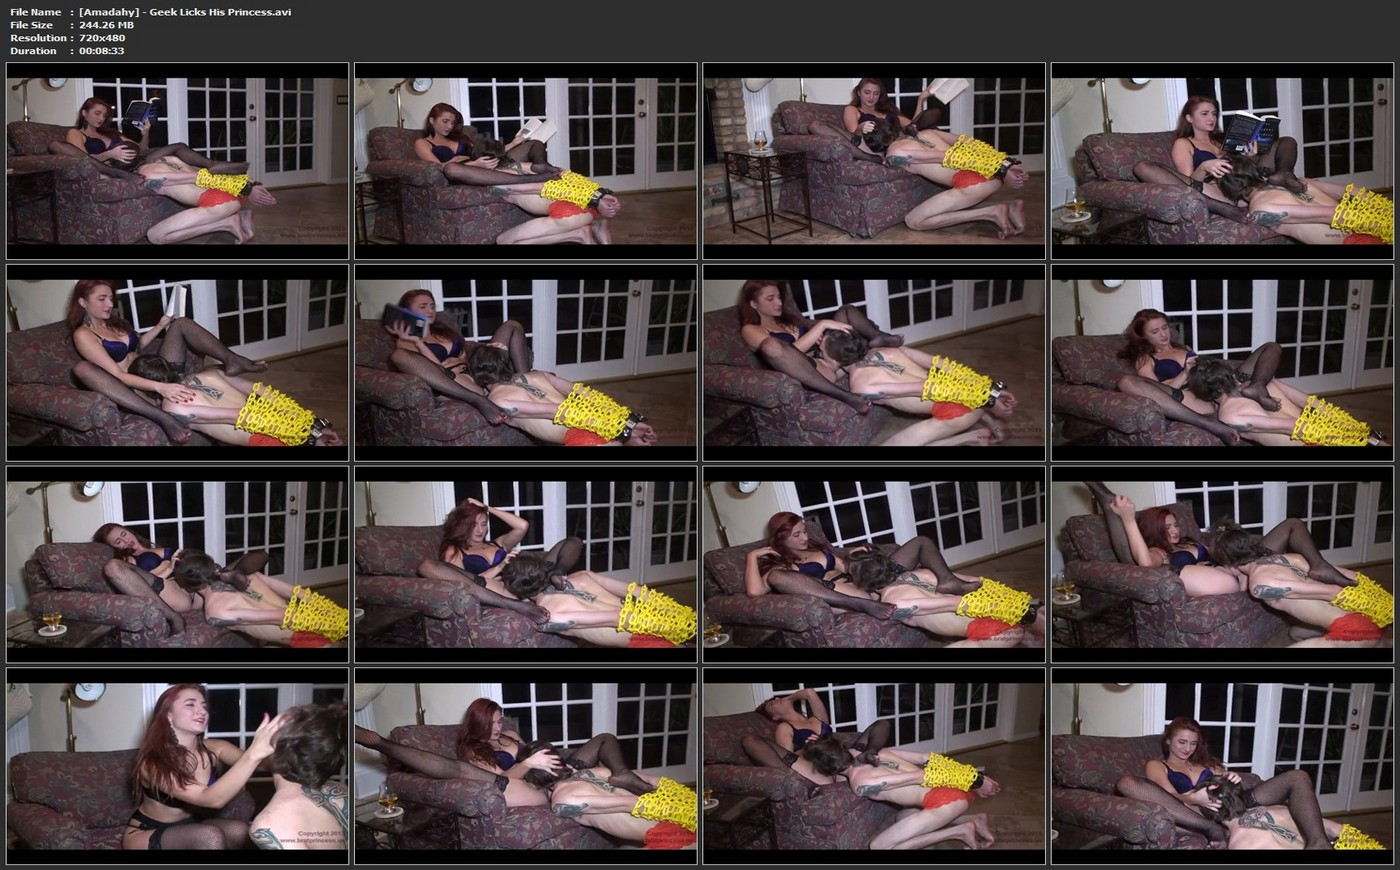 Download: Amadahy - Geek Licks His Princess.mp4